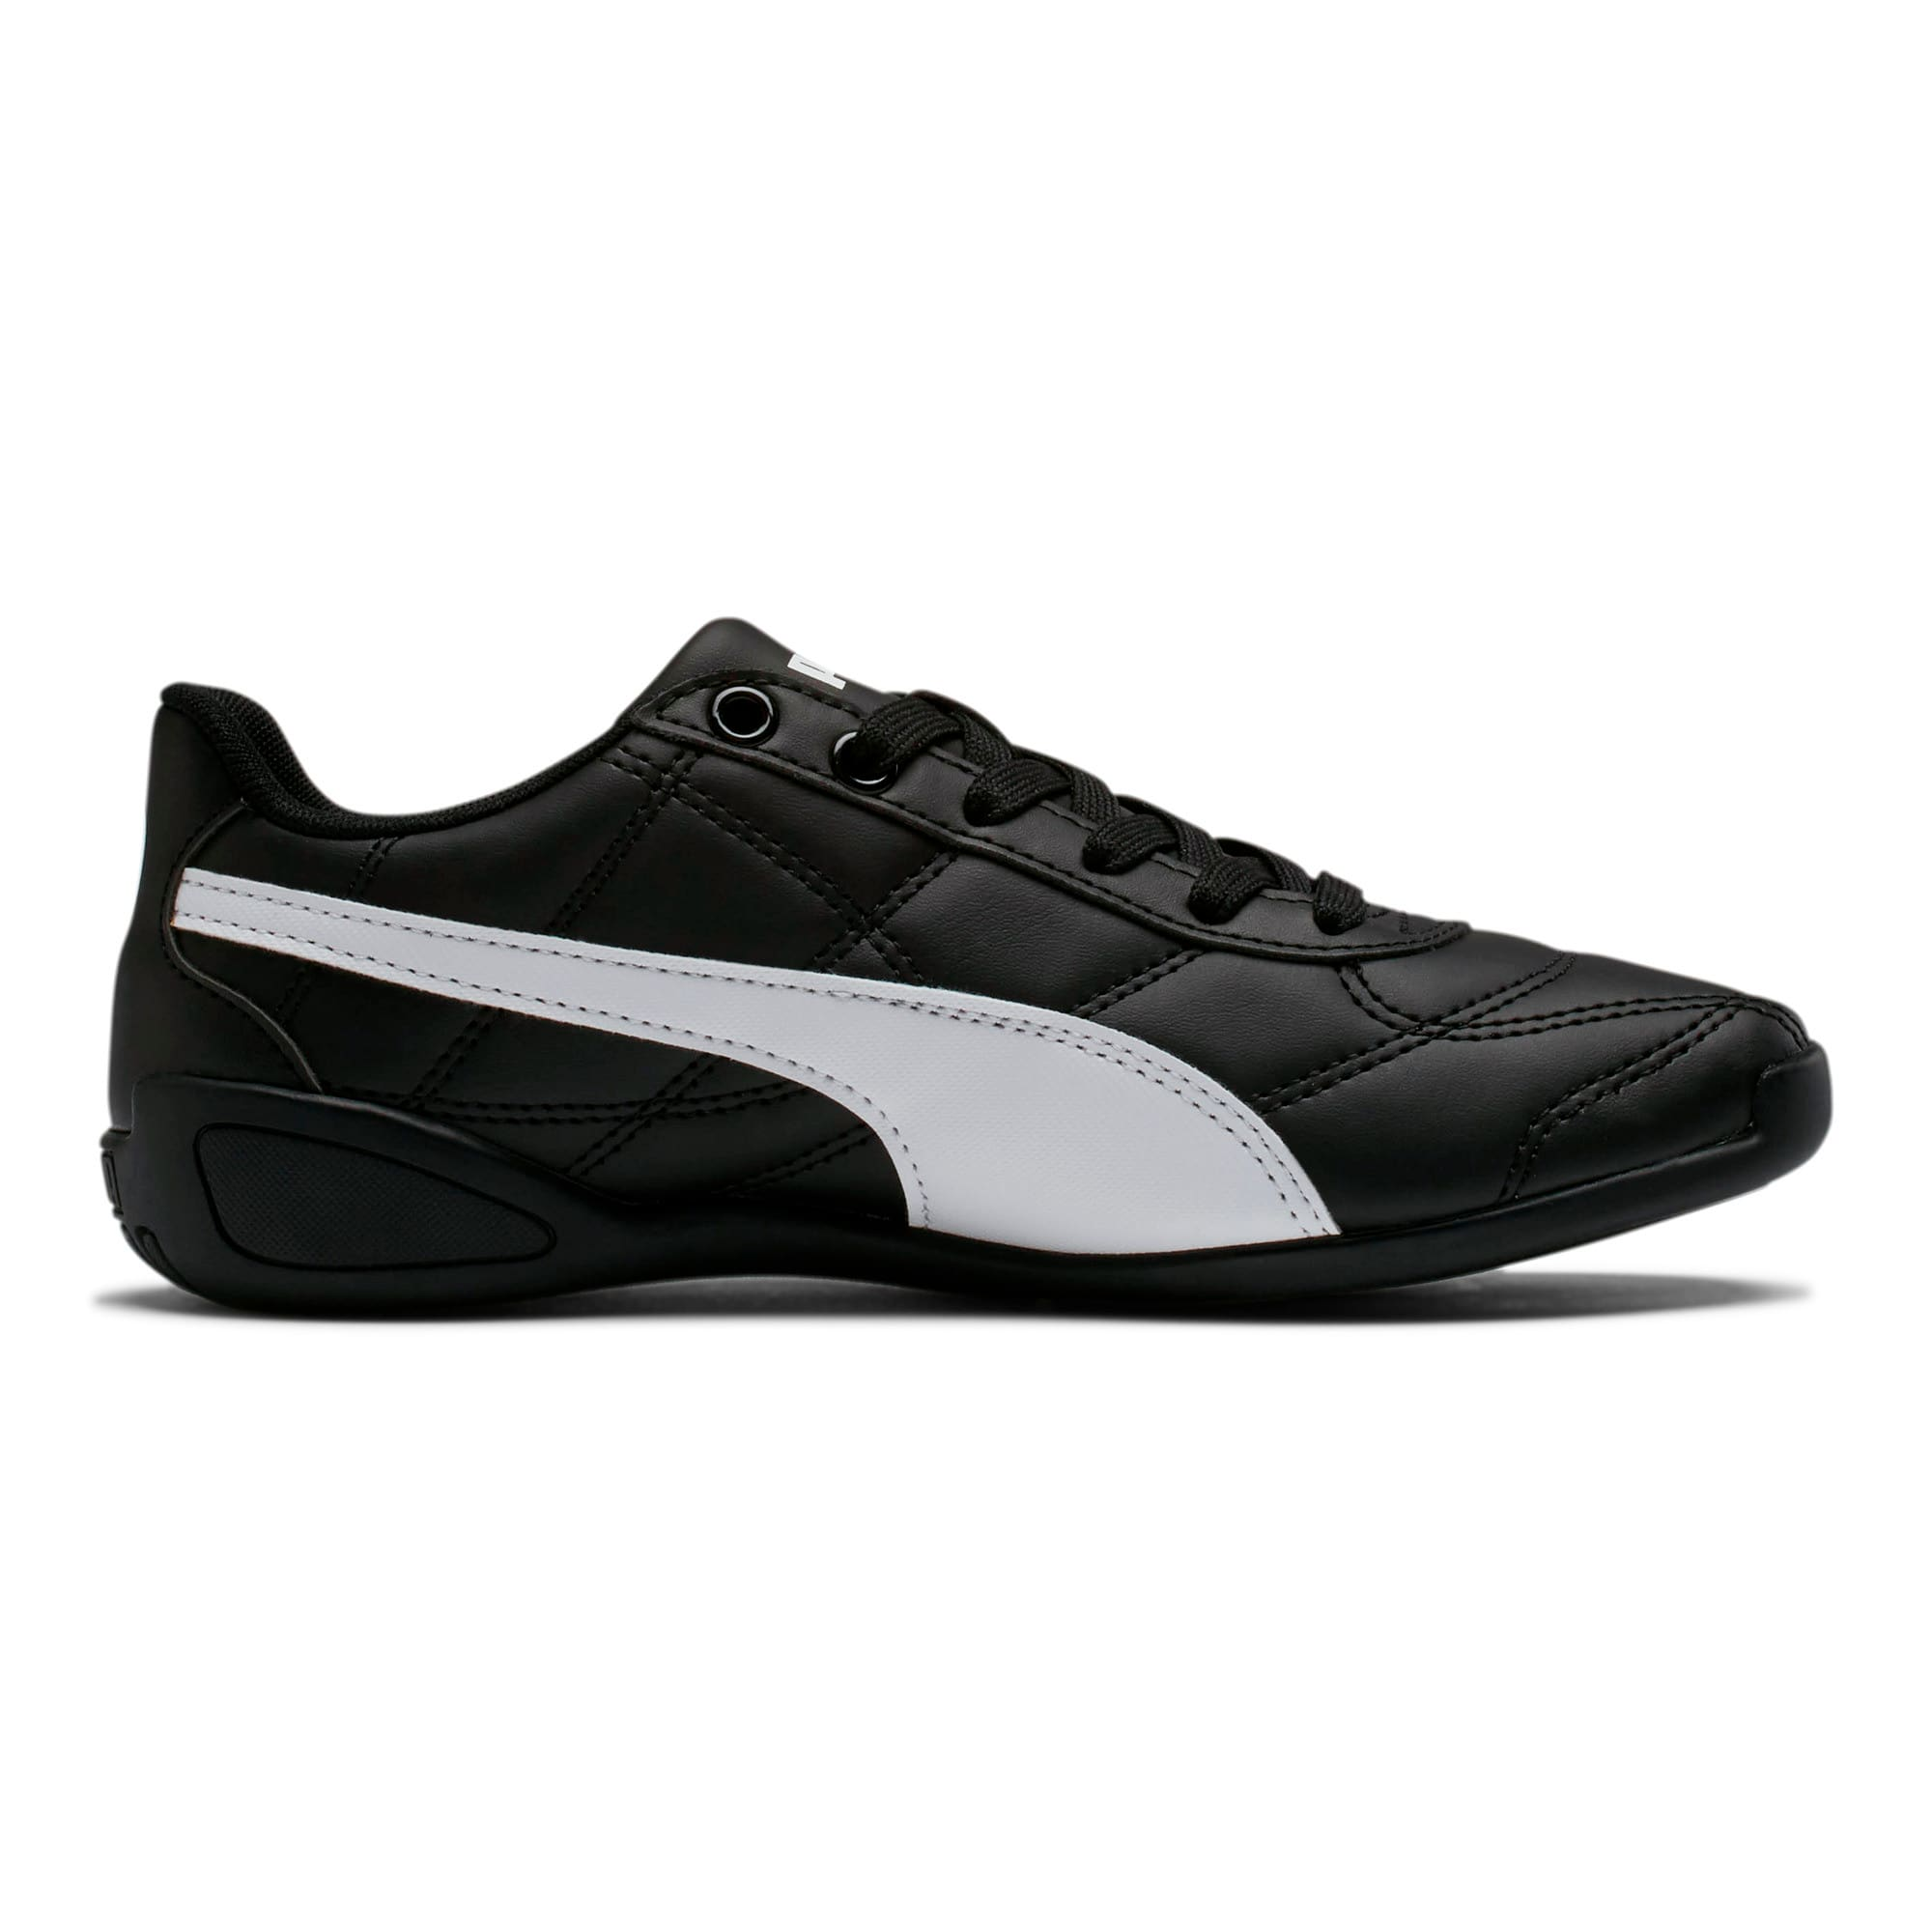 Thumbnail 5 of Tune Cat 3 Shoes JR, Puma Black-Puma White, medium